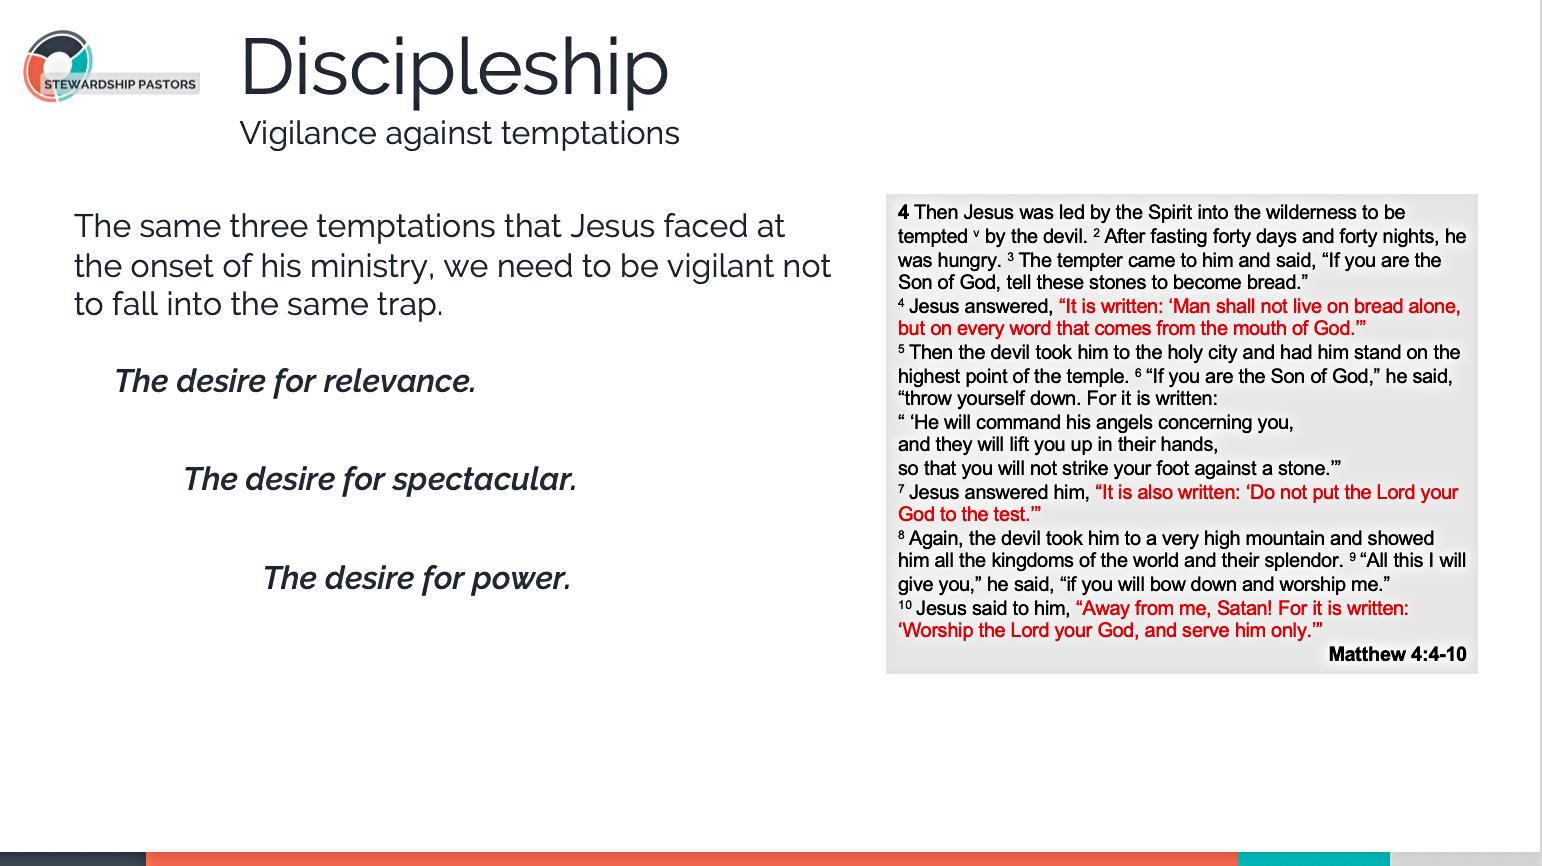 Vigilance against Temptation